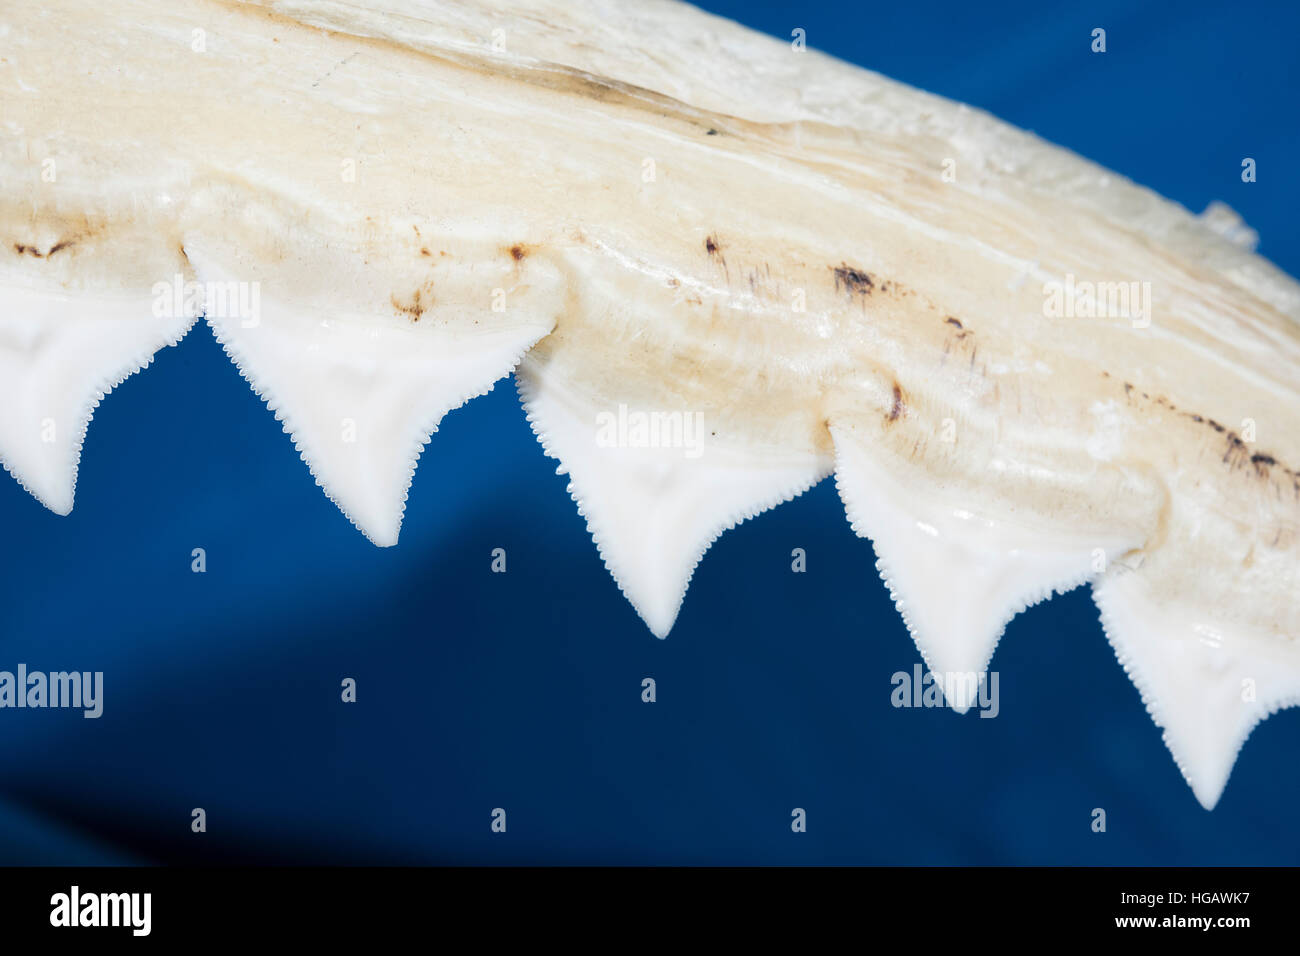 serrated teeth on upper jaw of bull shark, Carcharhinus leucas, used for grasping and tearing apart large prey, Birch Aquarium, La Jolla, California Stock Photo